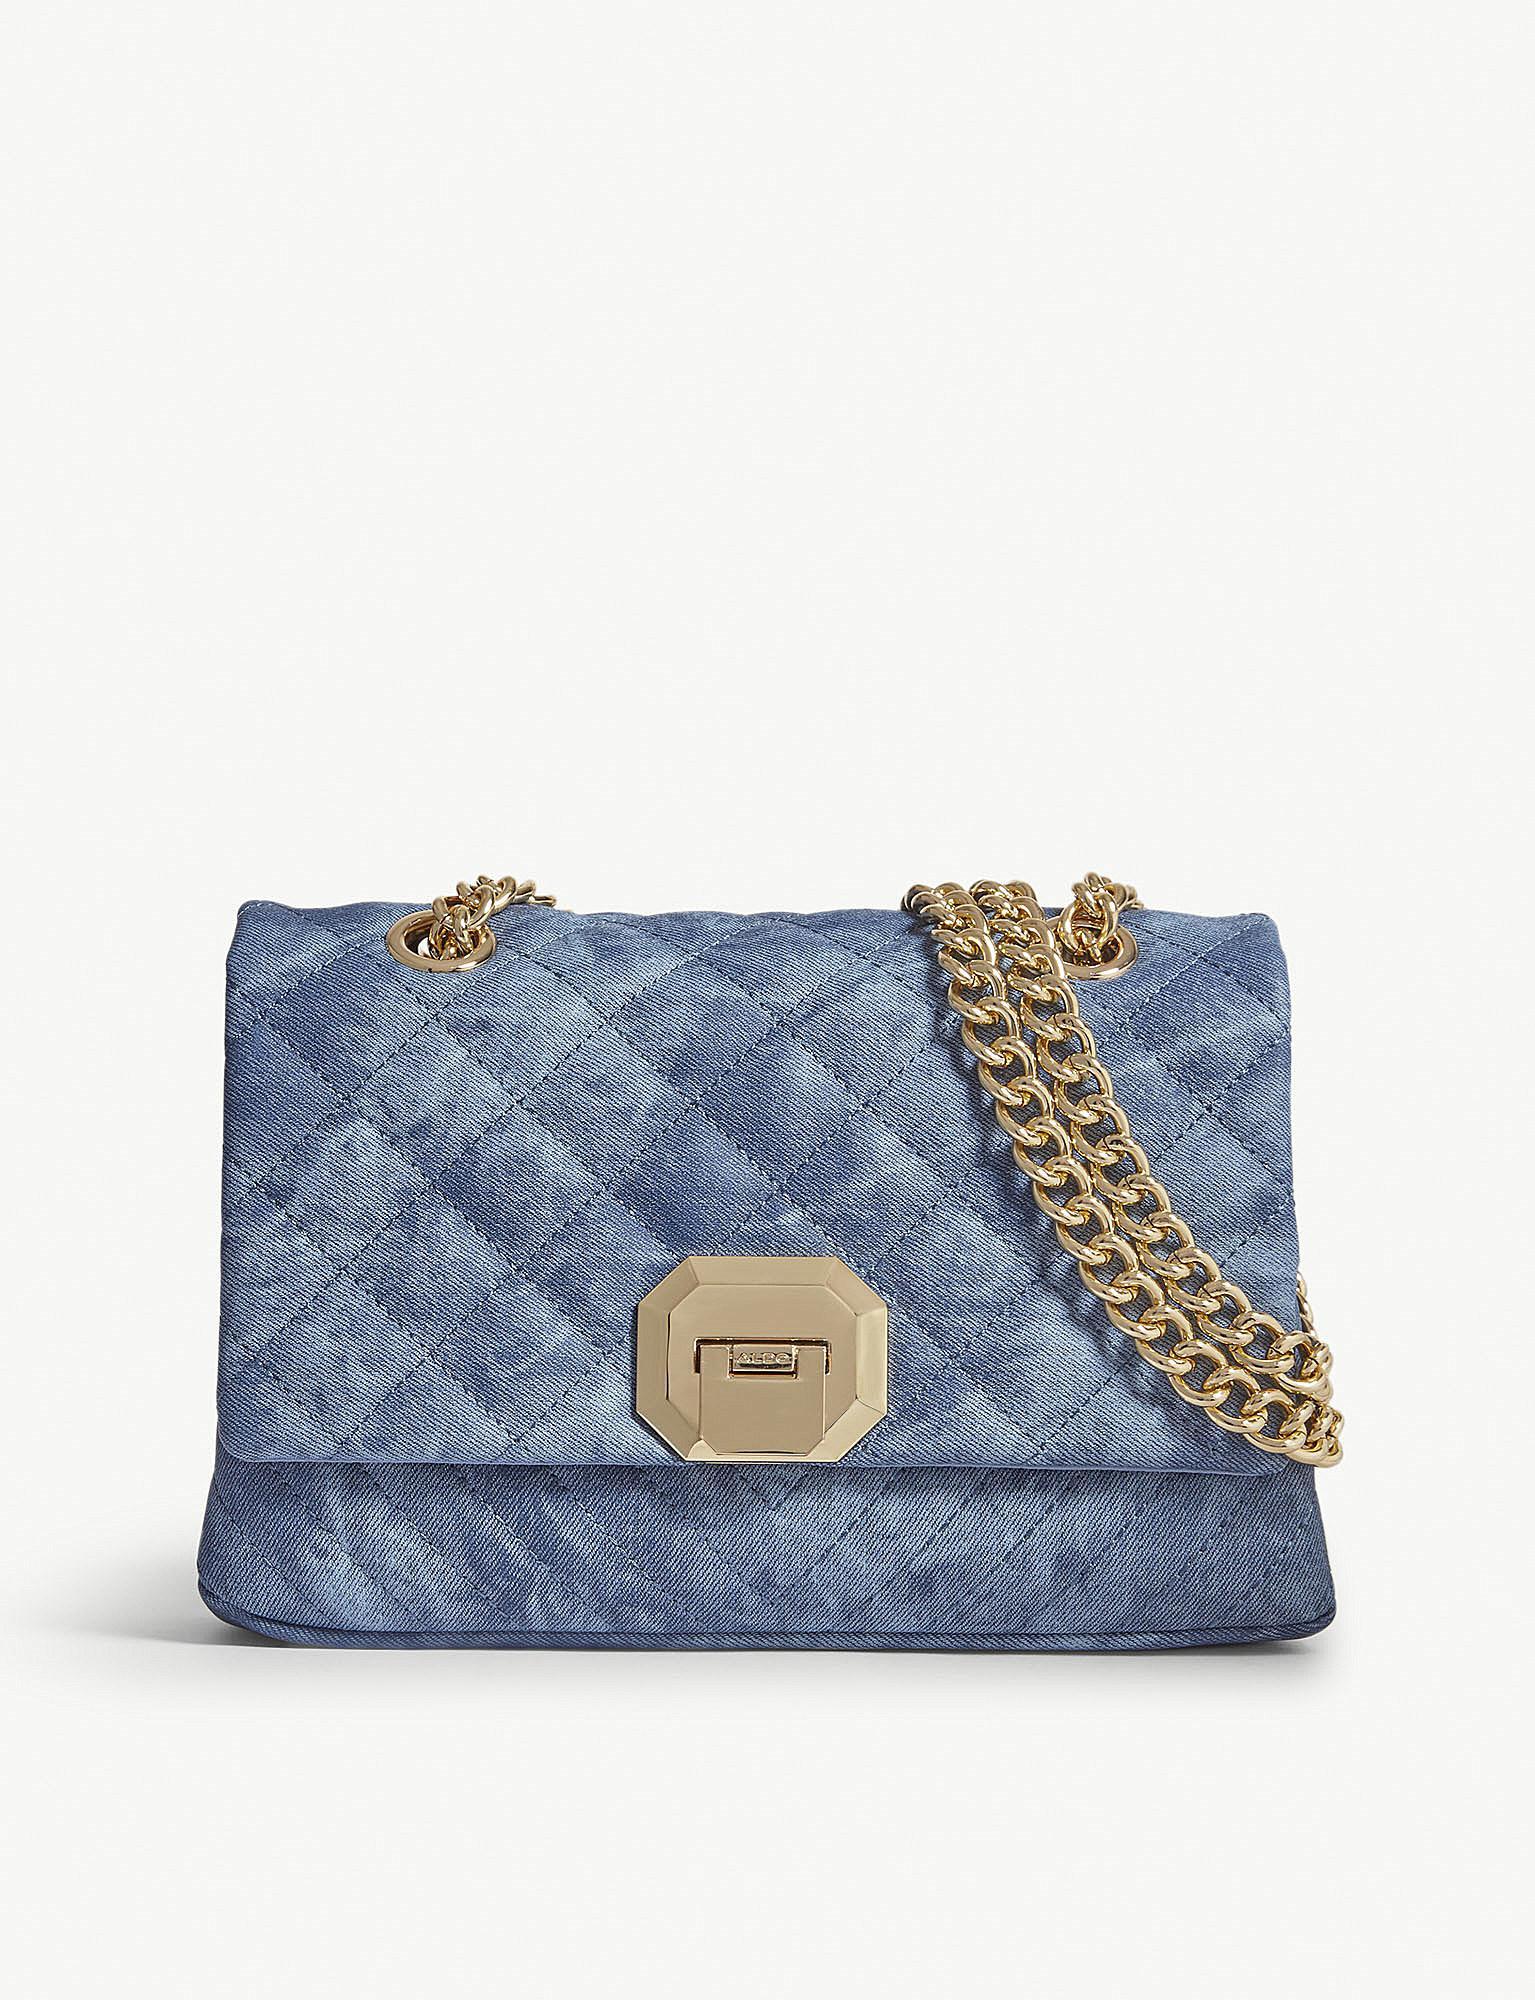 9fcc1321206 Lyst - ALDO Menifee Quilted Cross-body Bag in Blue